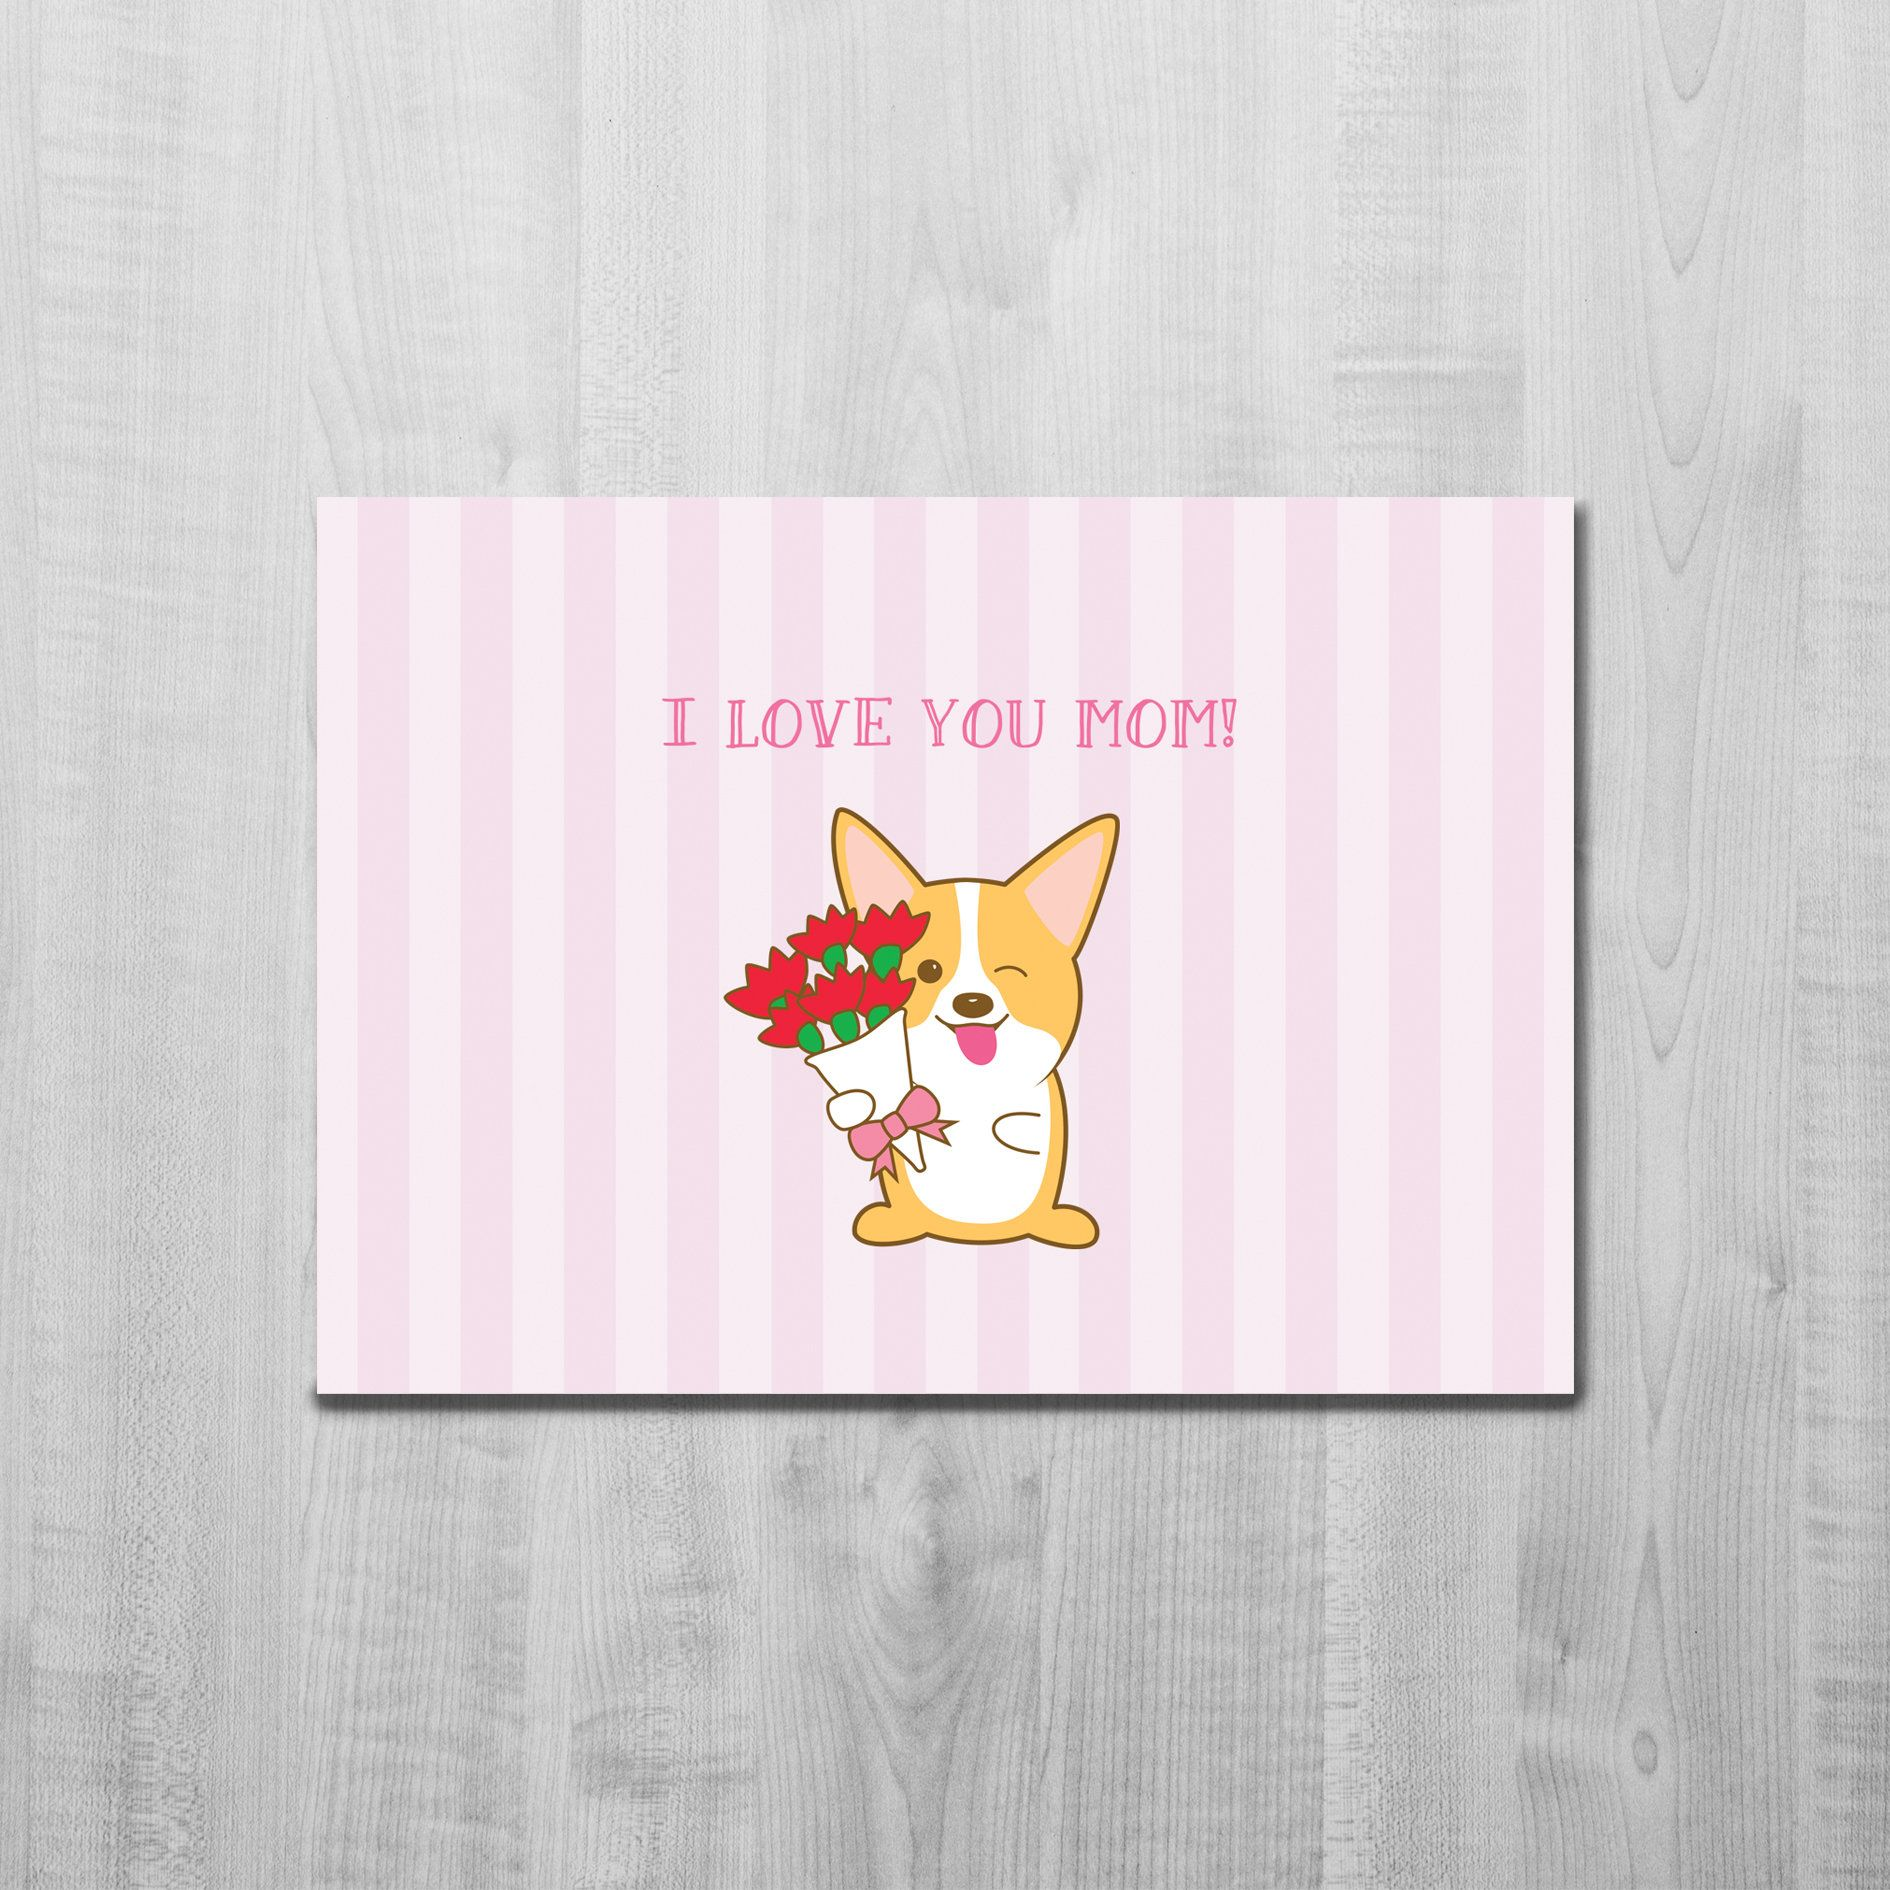 Corgi Mother s Day Card I Love You Mom Cute Sweet Flowers